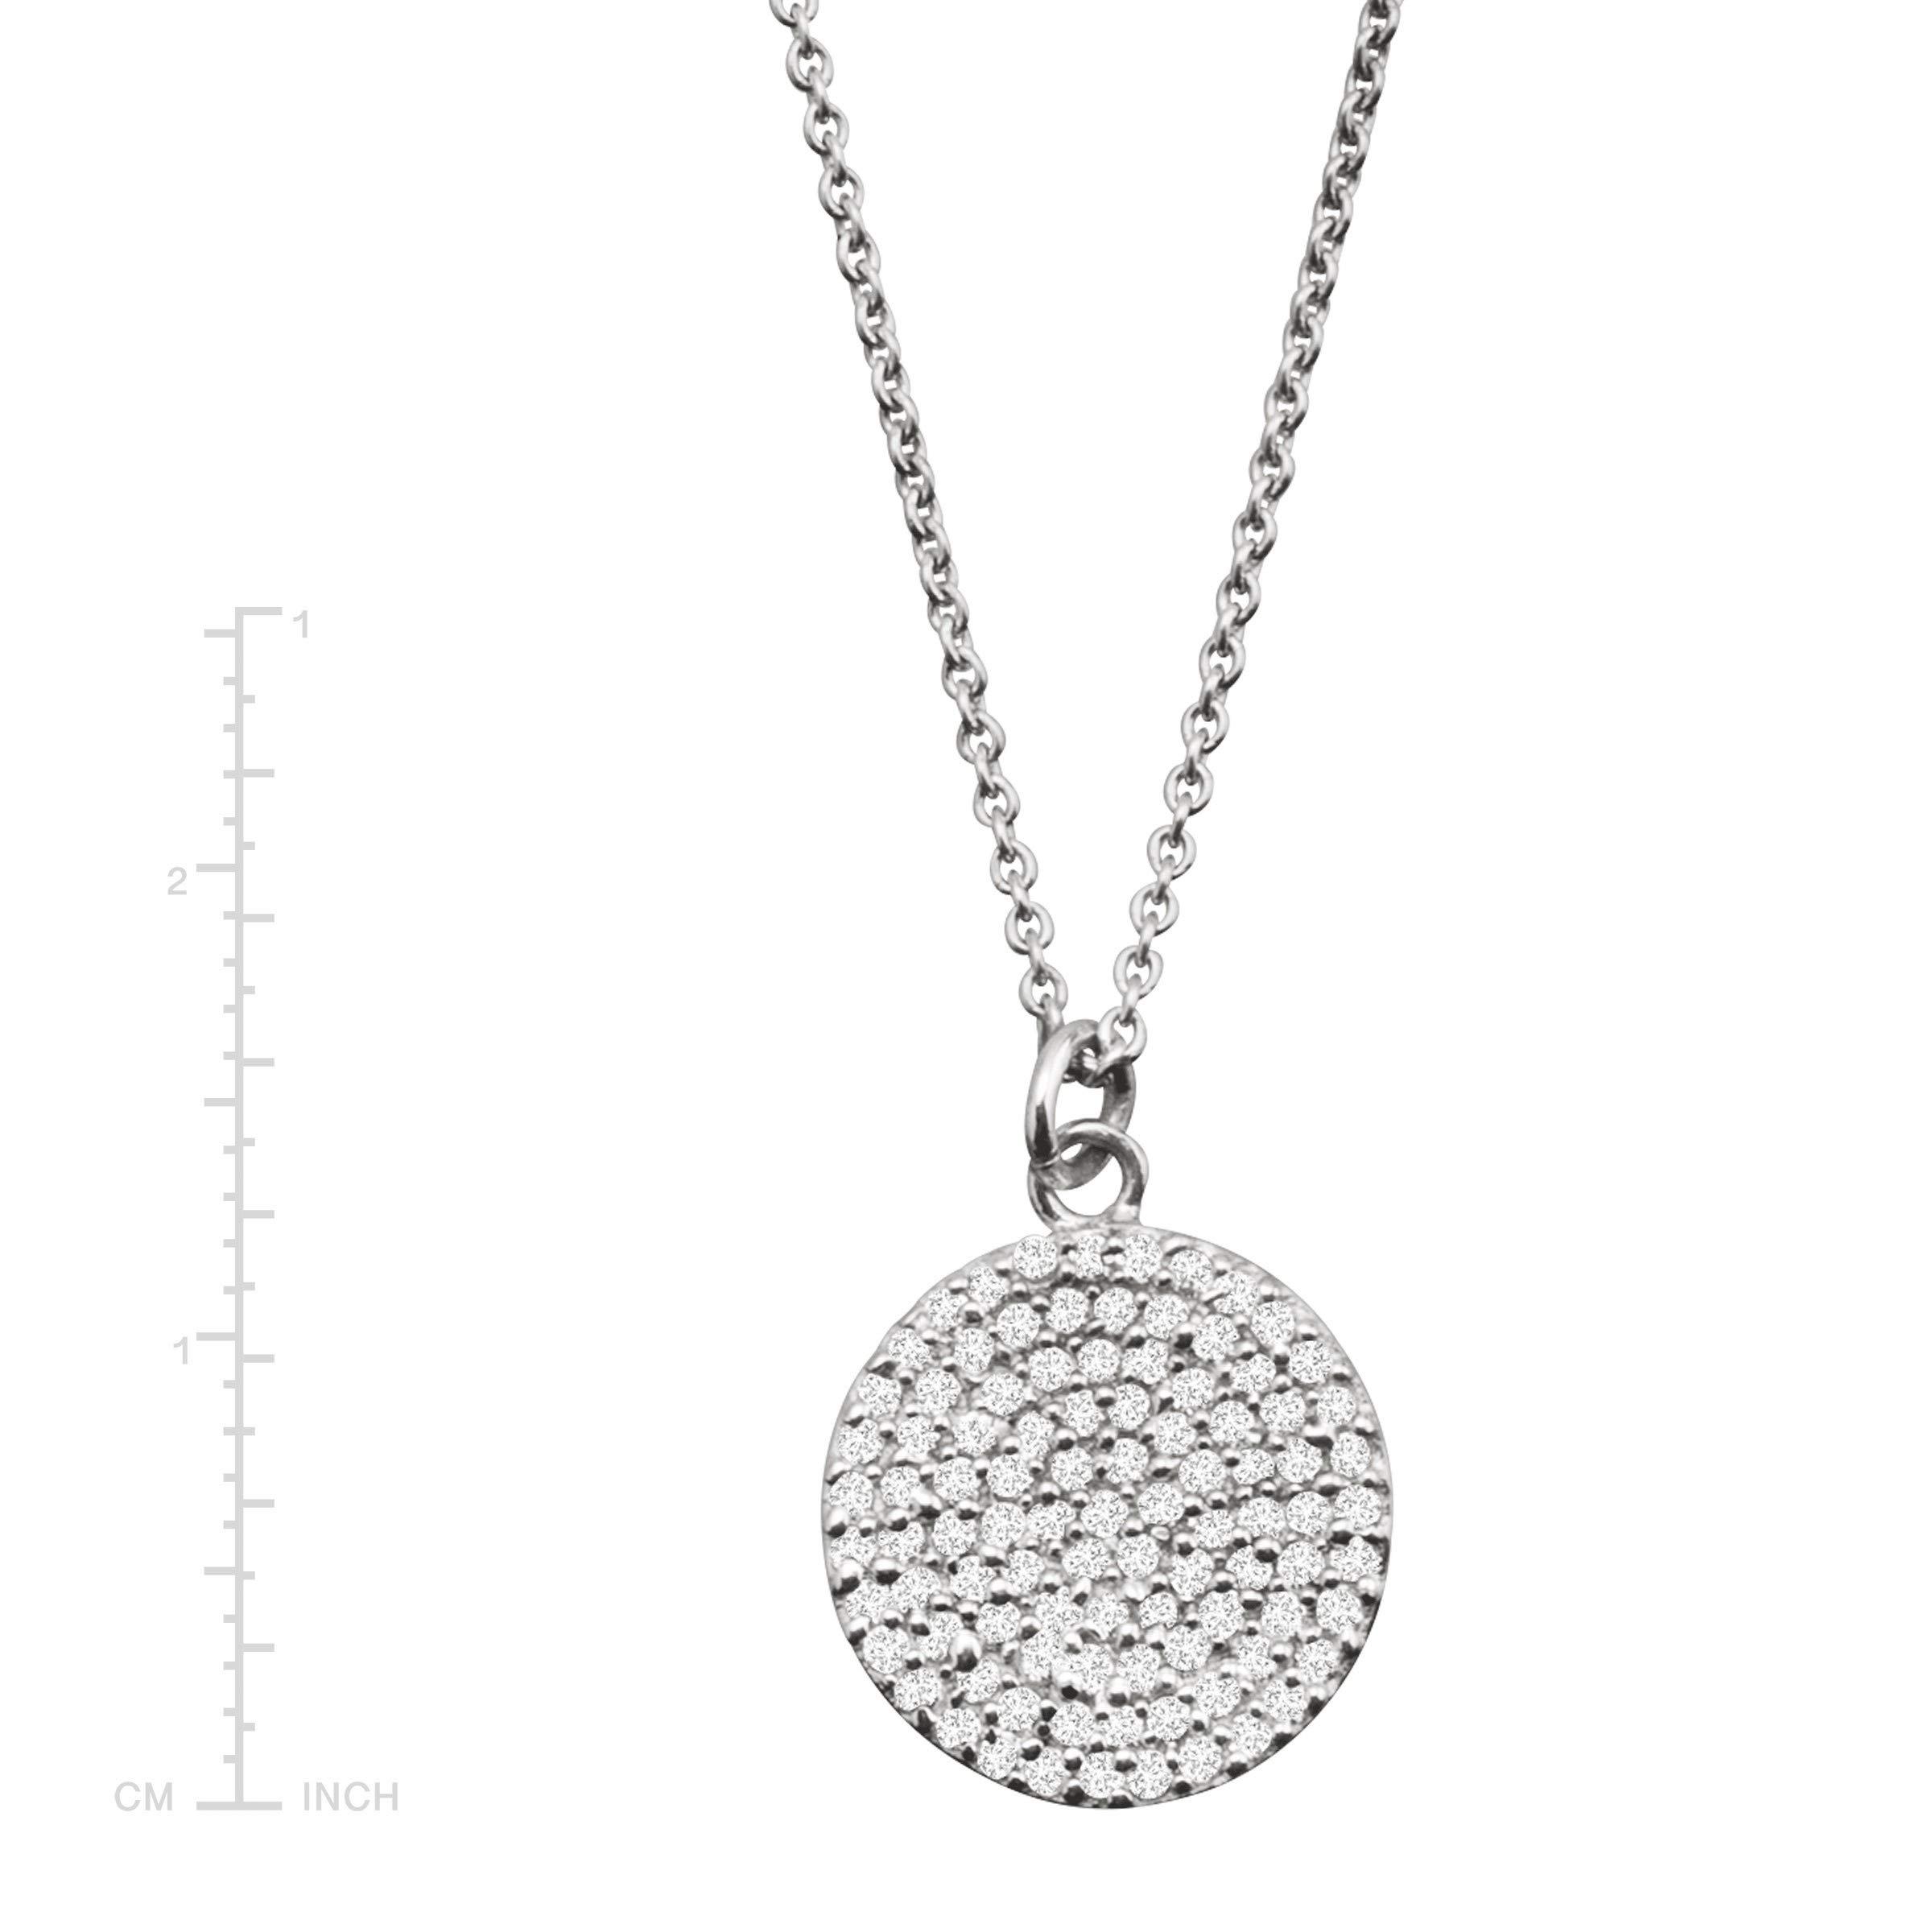 Silpada 'Triple Drop' 1/2 ct Cubic Zirconia Necklace in Sterling Silver by Silpada (Image #4)